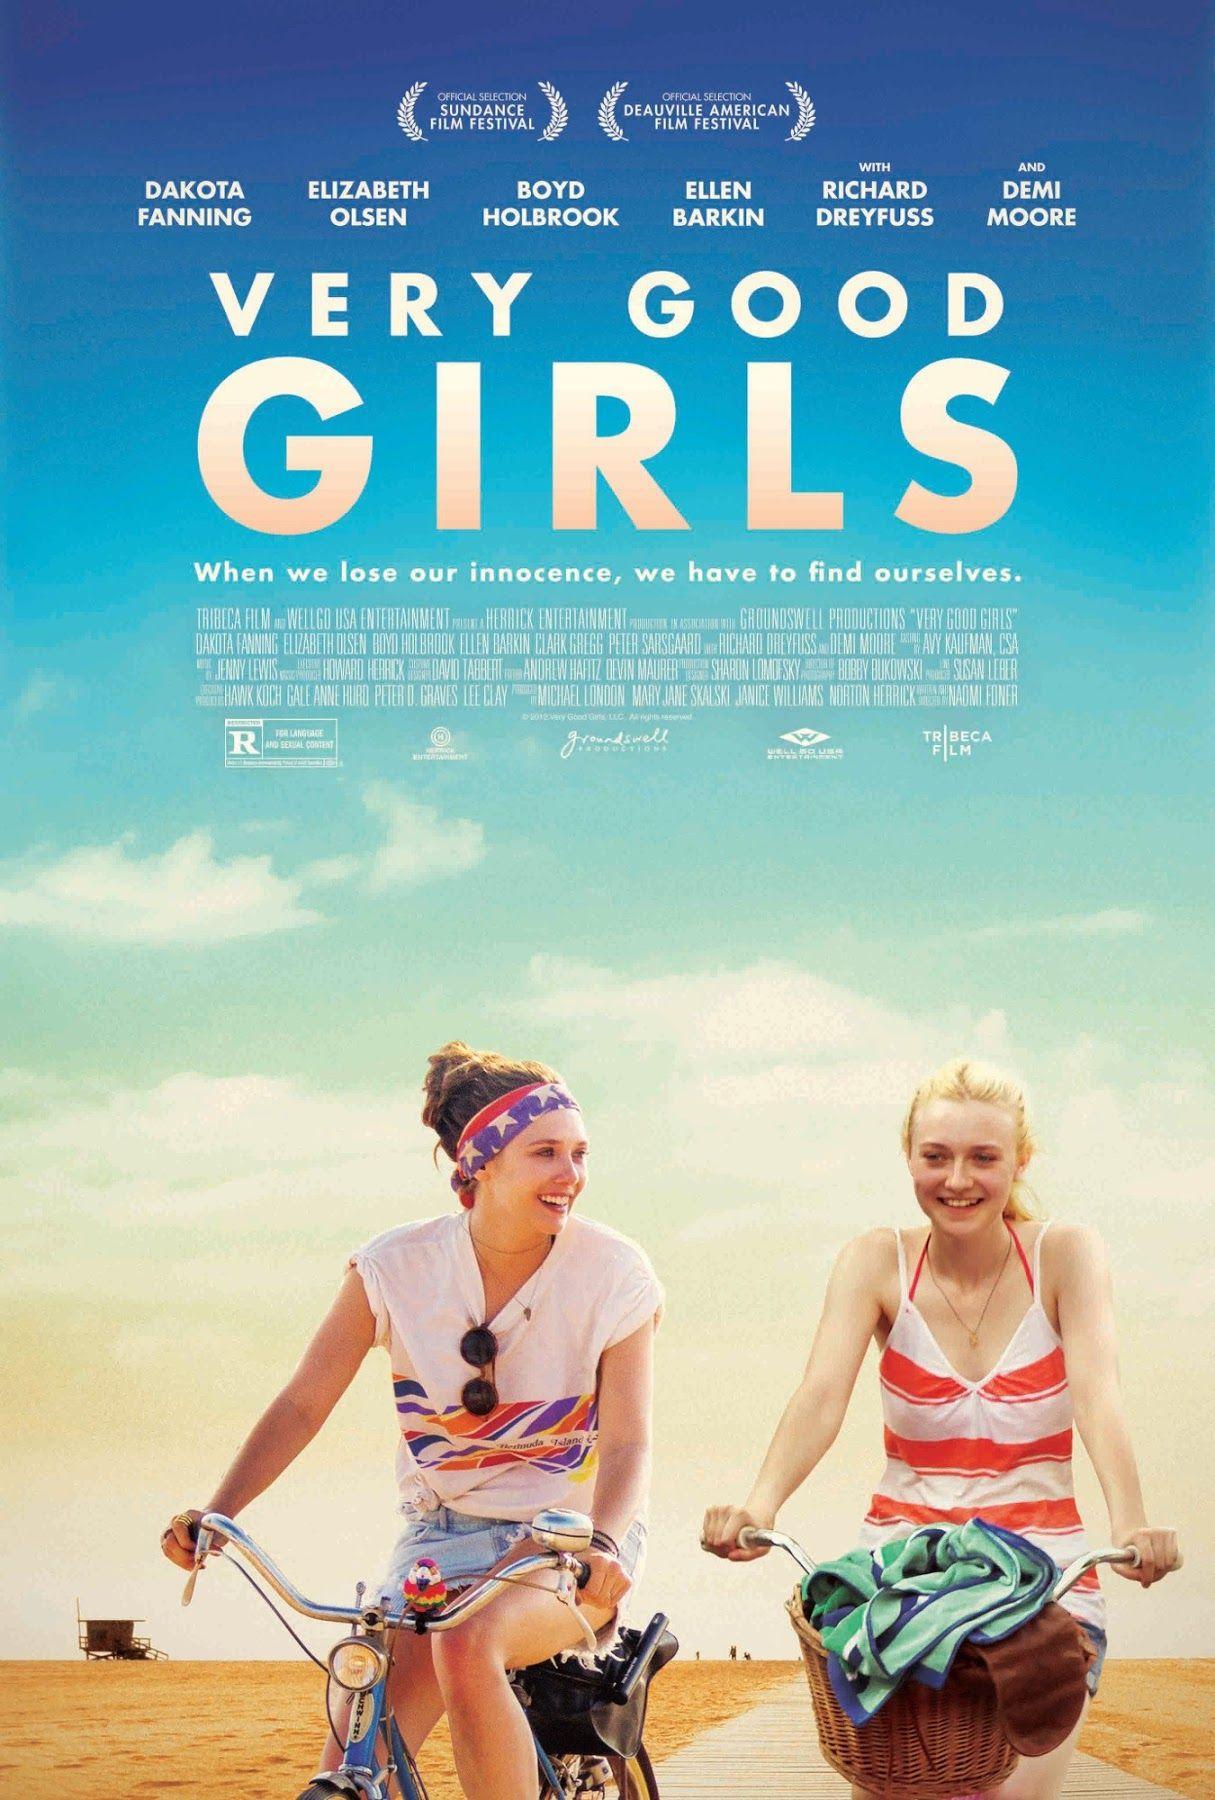 Very Good Girls (2013) - I want to watch this, love Dakota Fanning and Elizabeth Olsen <3